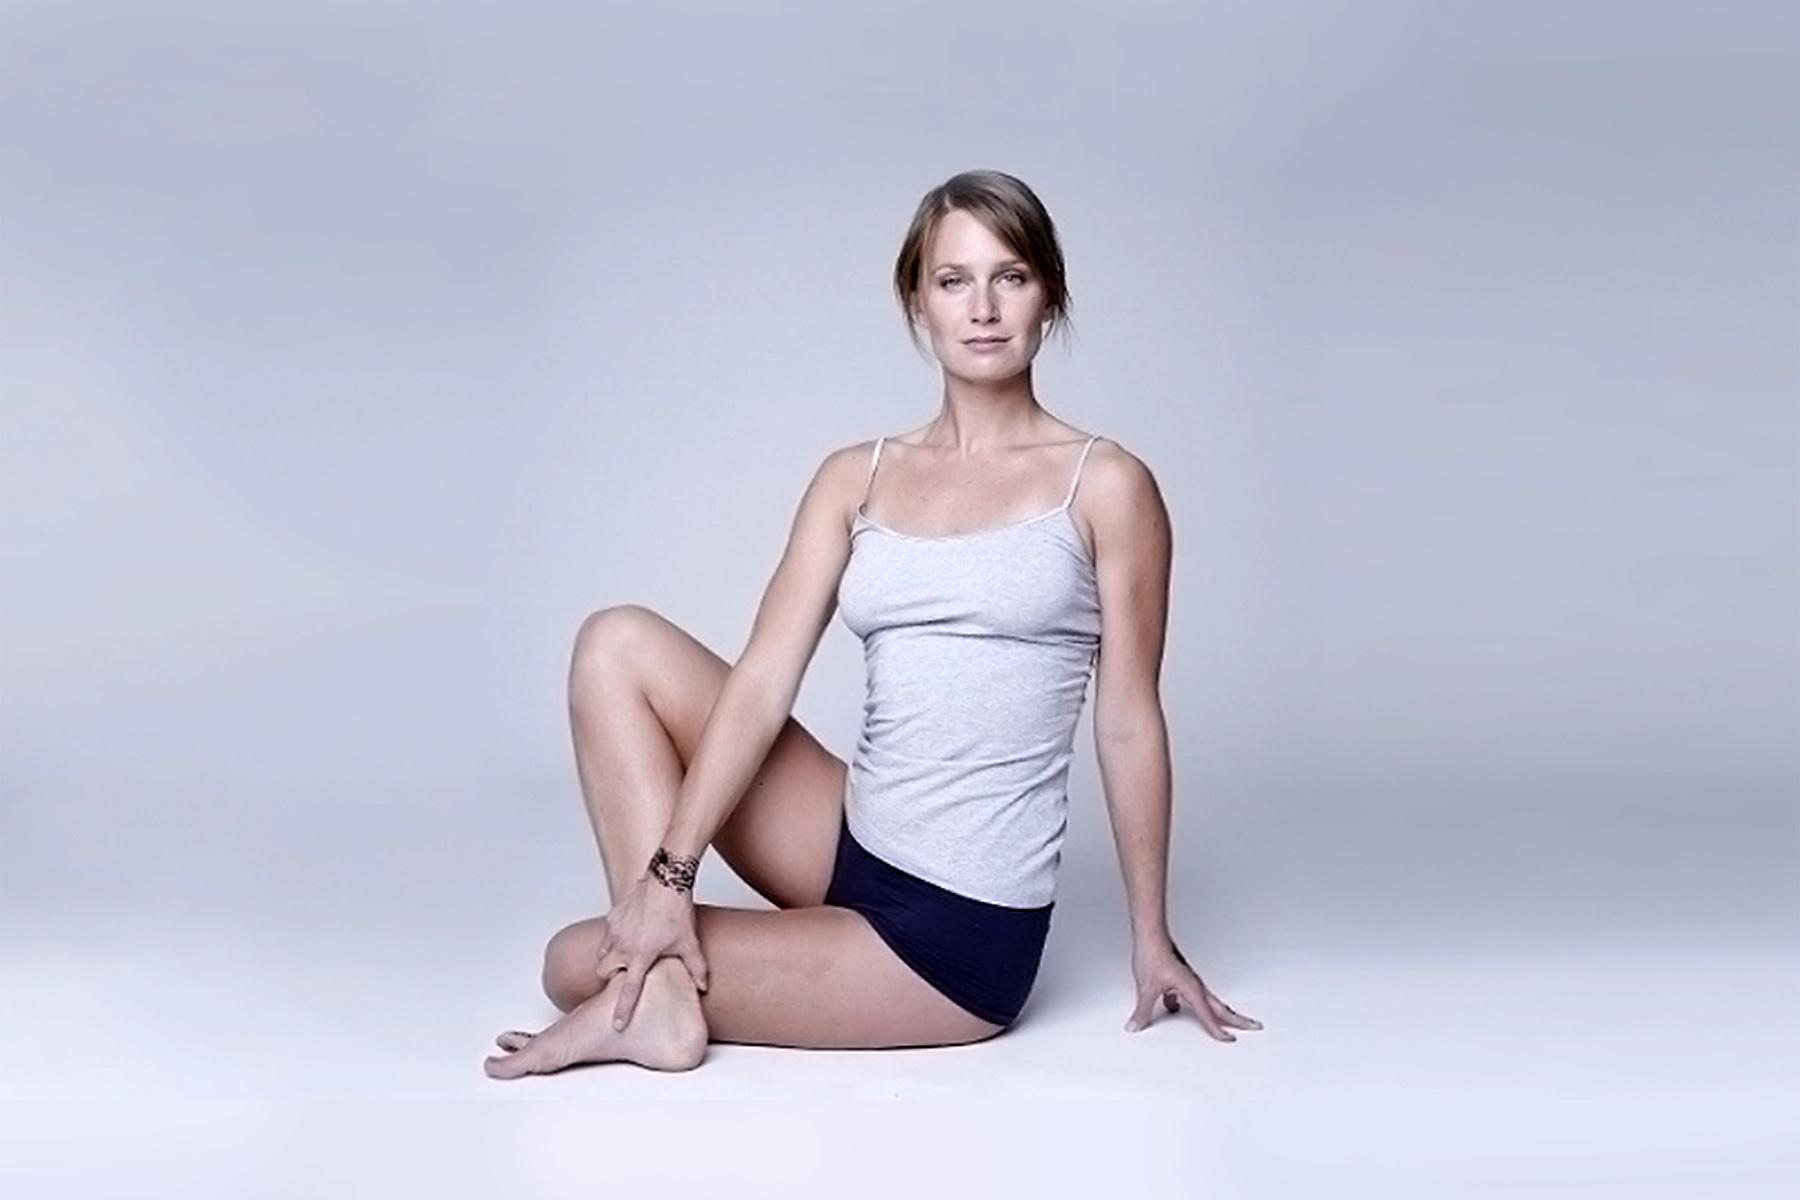 Kurs_vinyasa-flow-yoga_Stine_Lethan